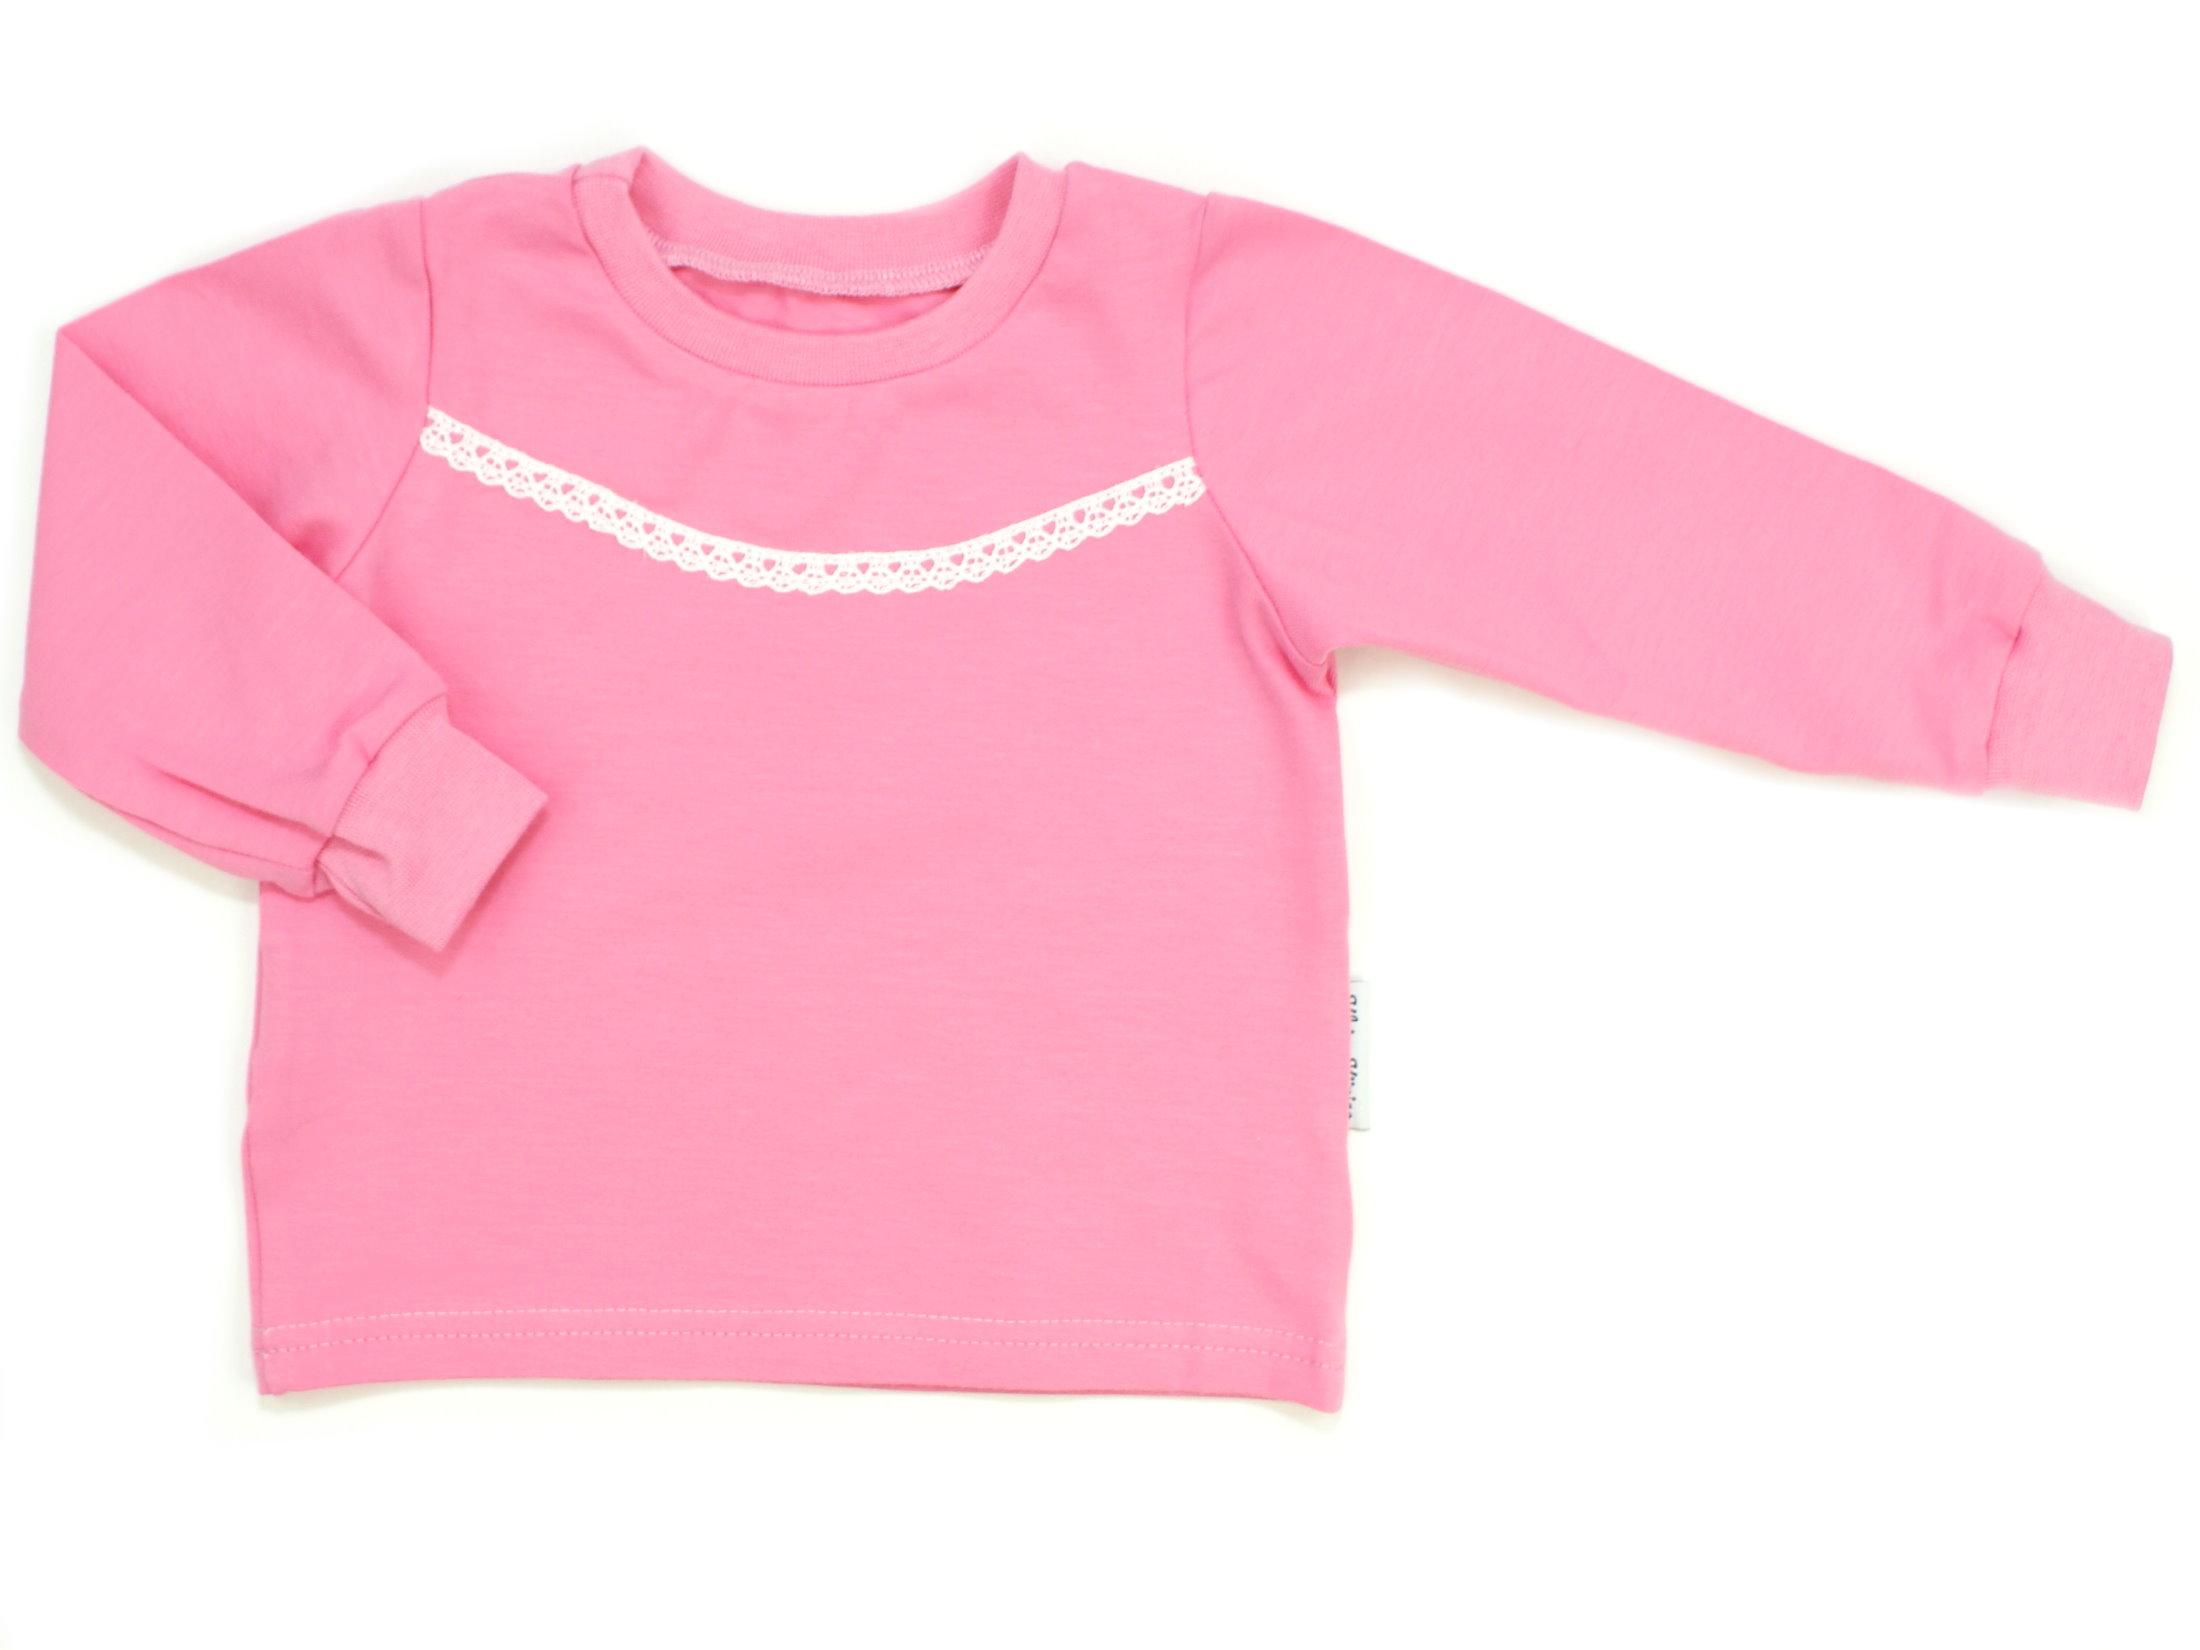 Kinder Langarmshirt uni rosa Spitze weiß